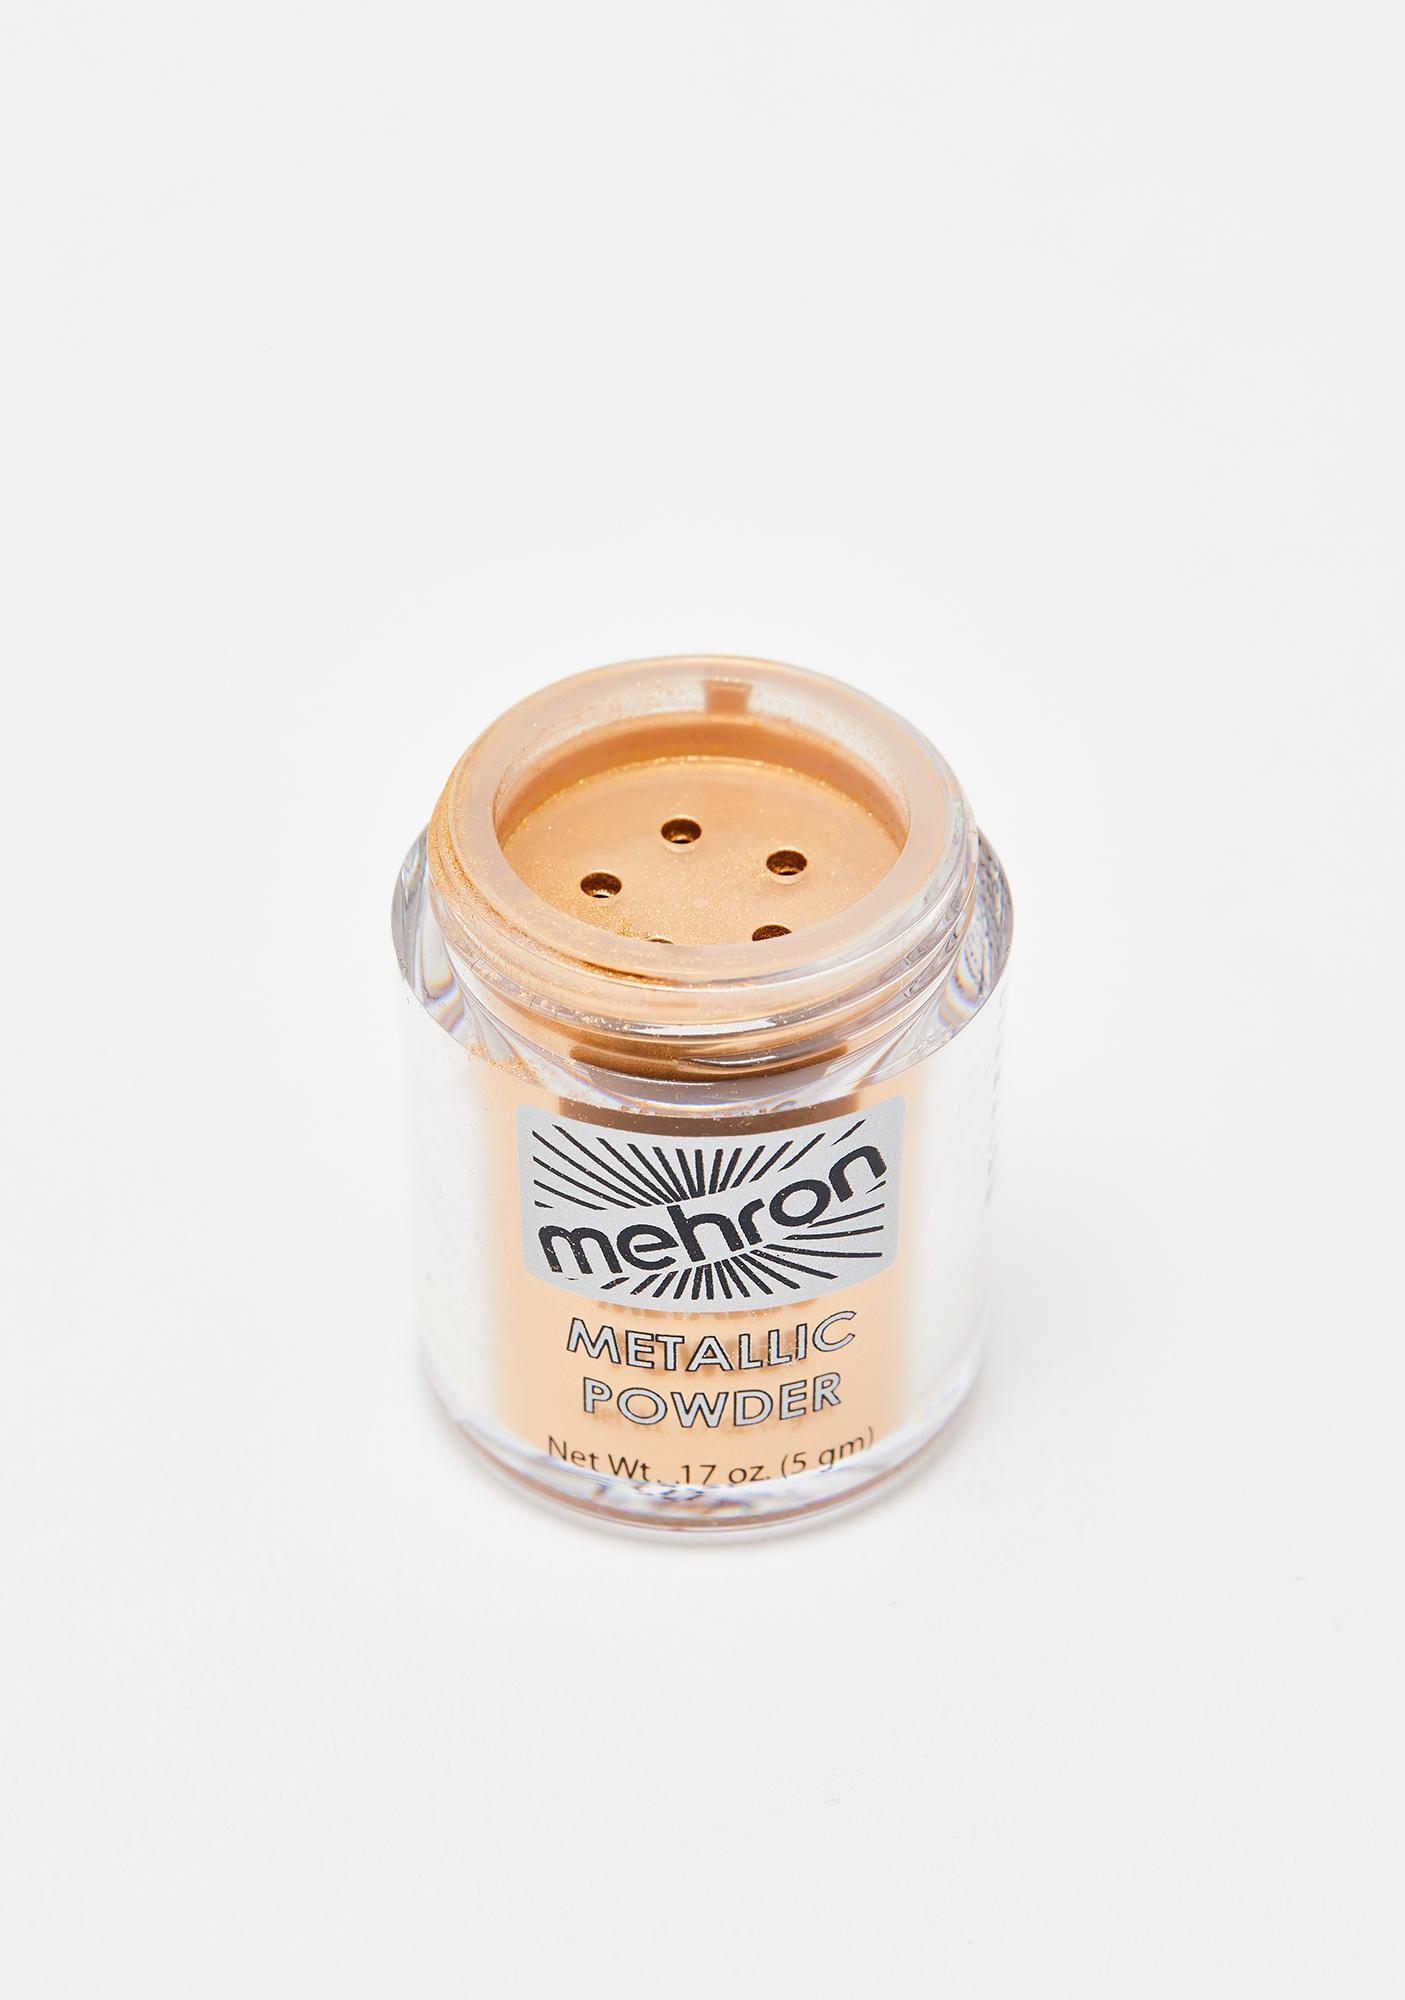 Mehron Gold Metallic Powder With Makeup Remover Lotion